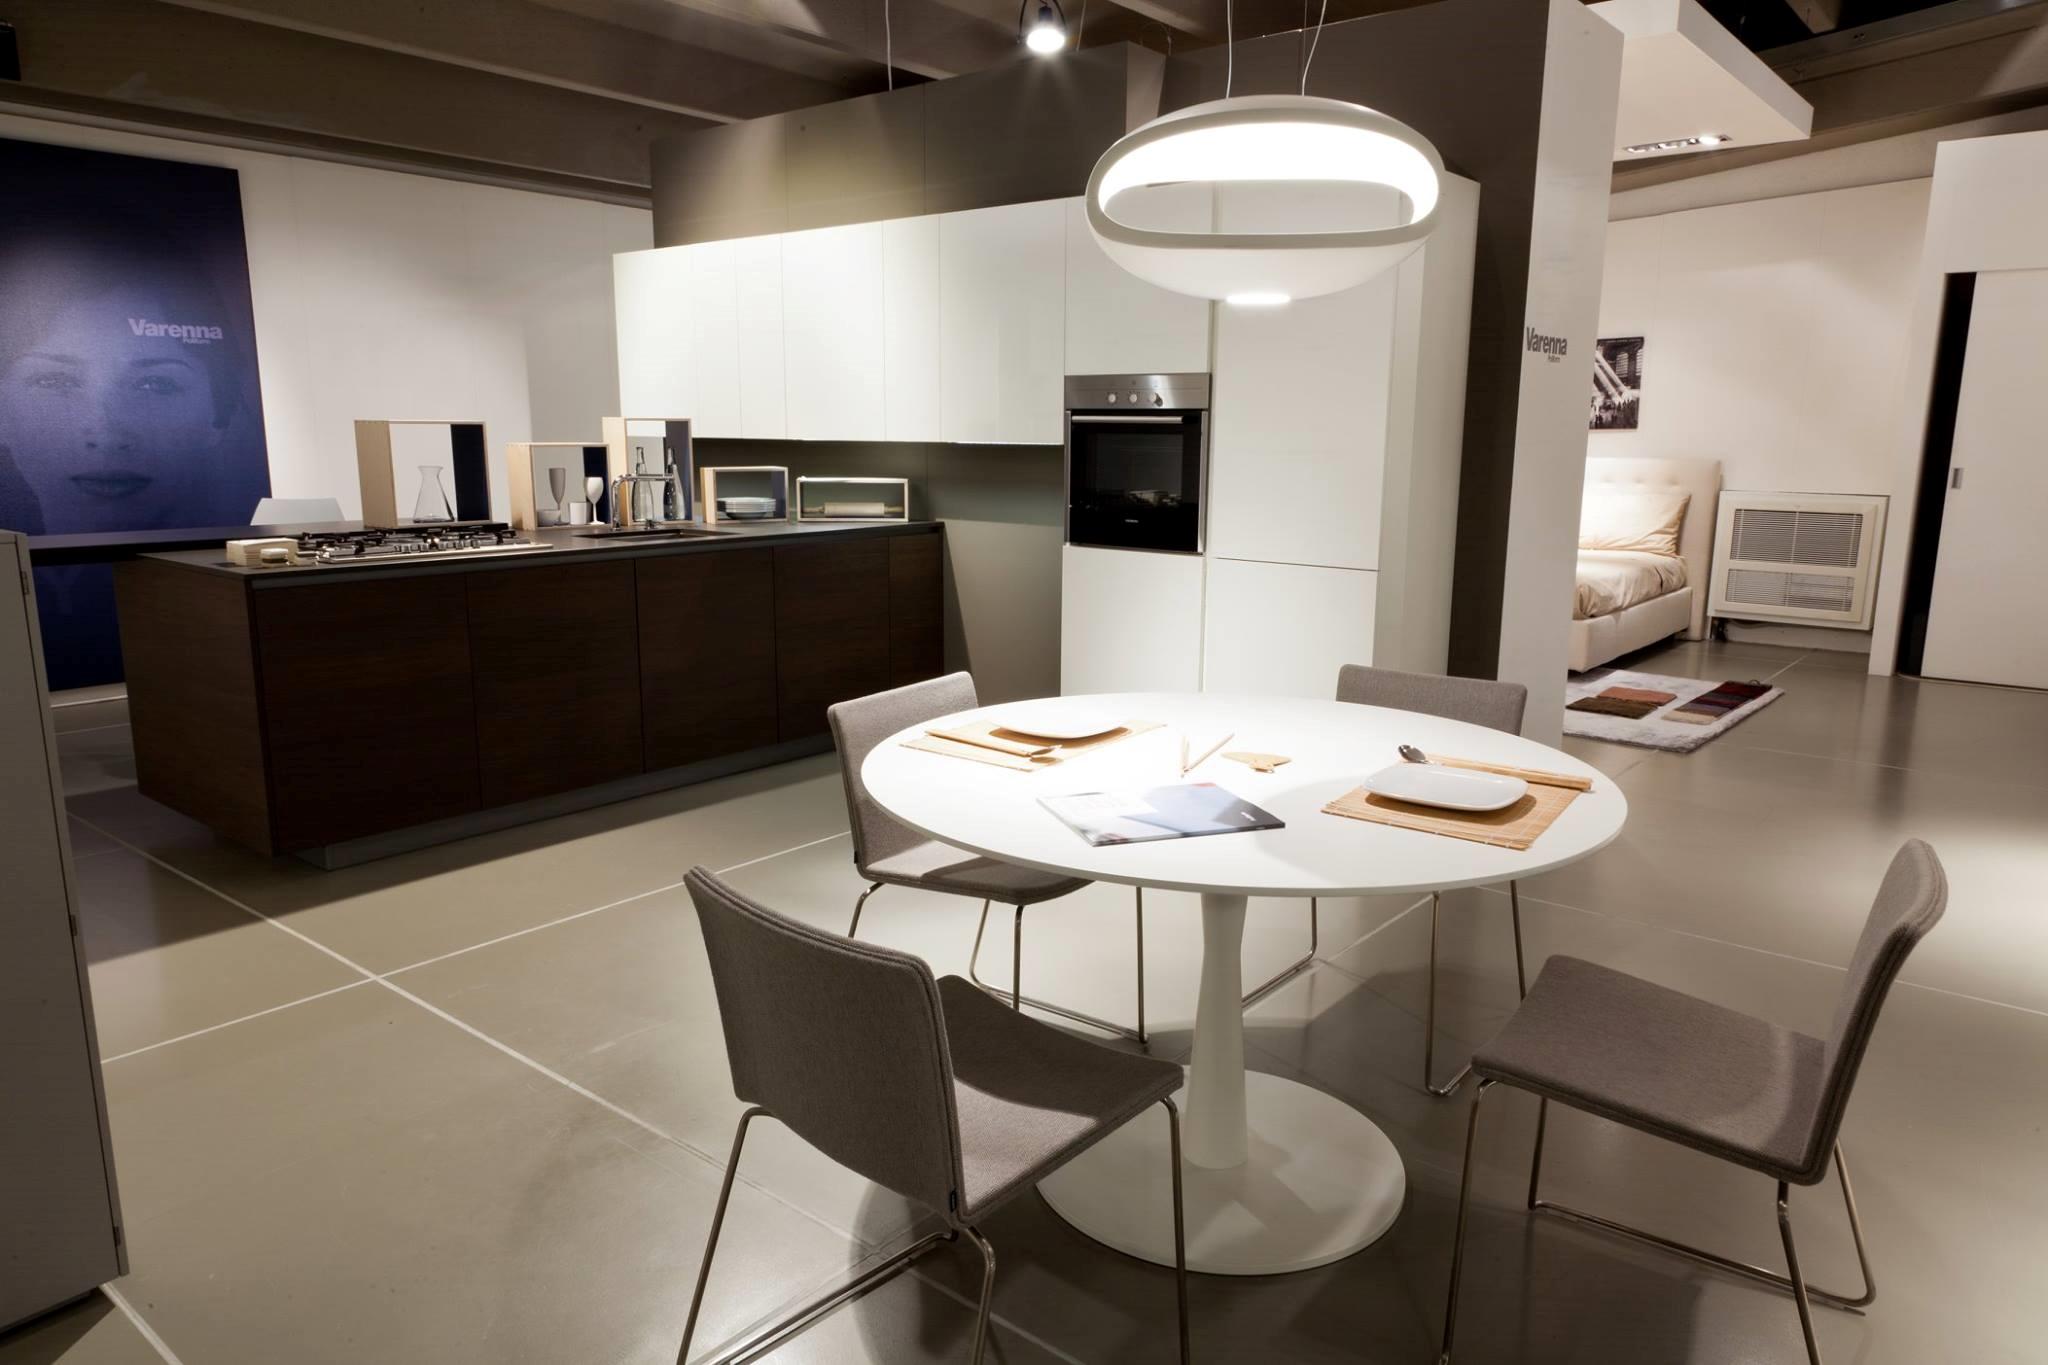 Beautiful Poliform Cucine Prezzi Ideas - Home Design - joygree.info